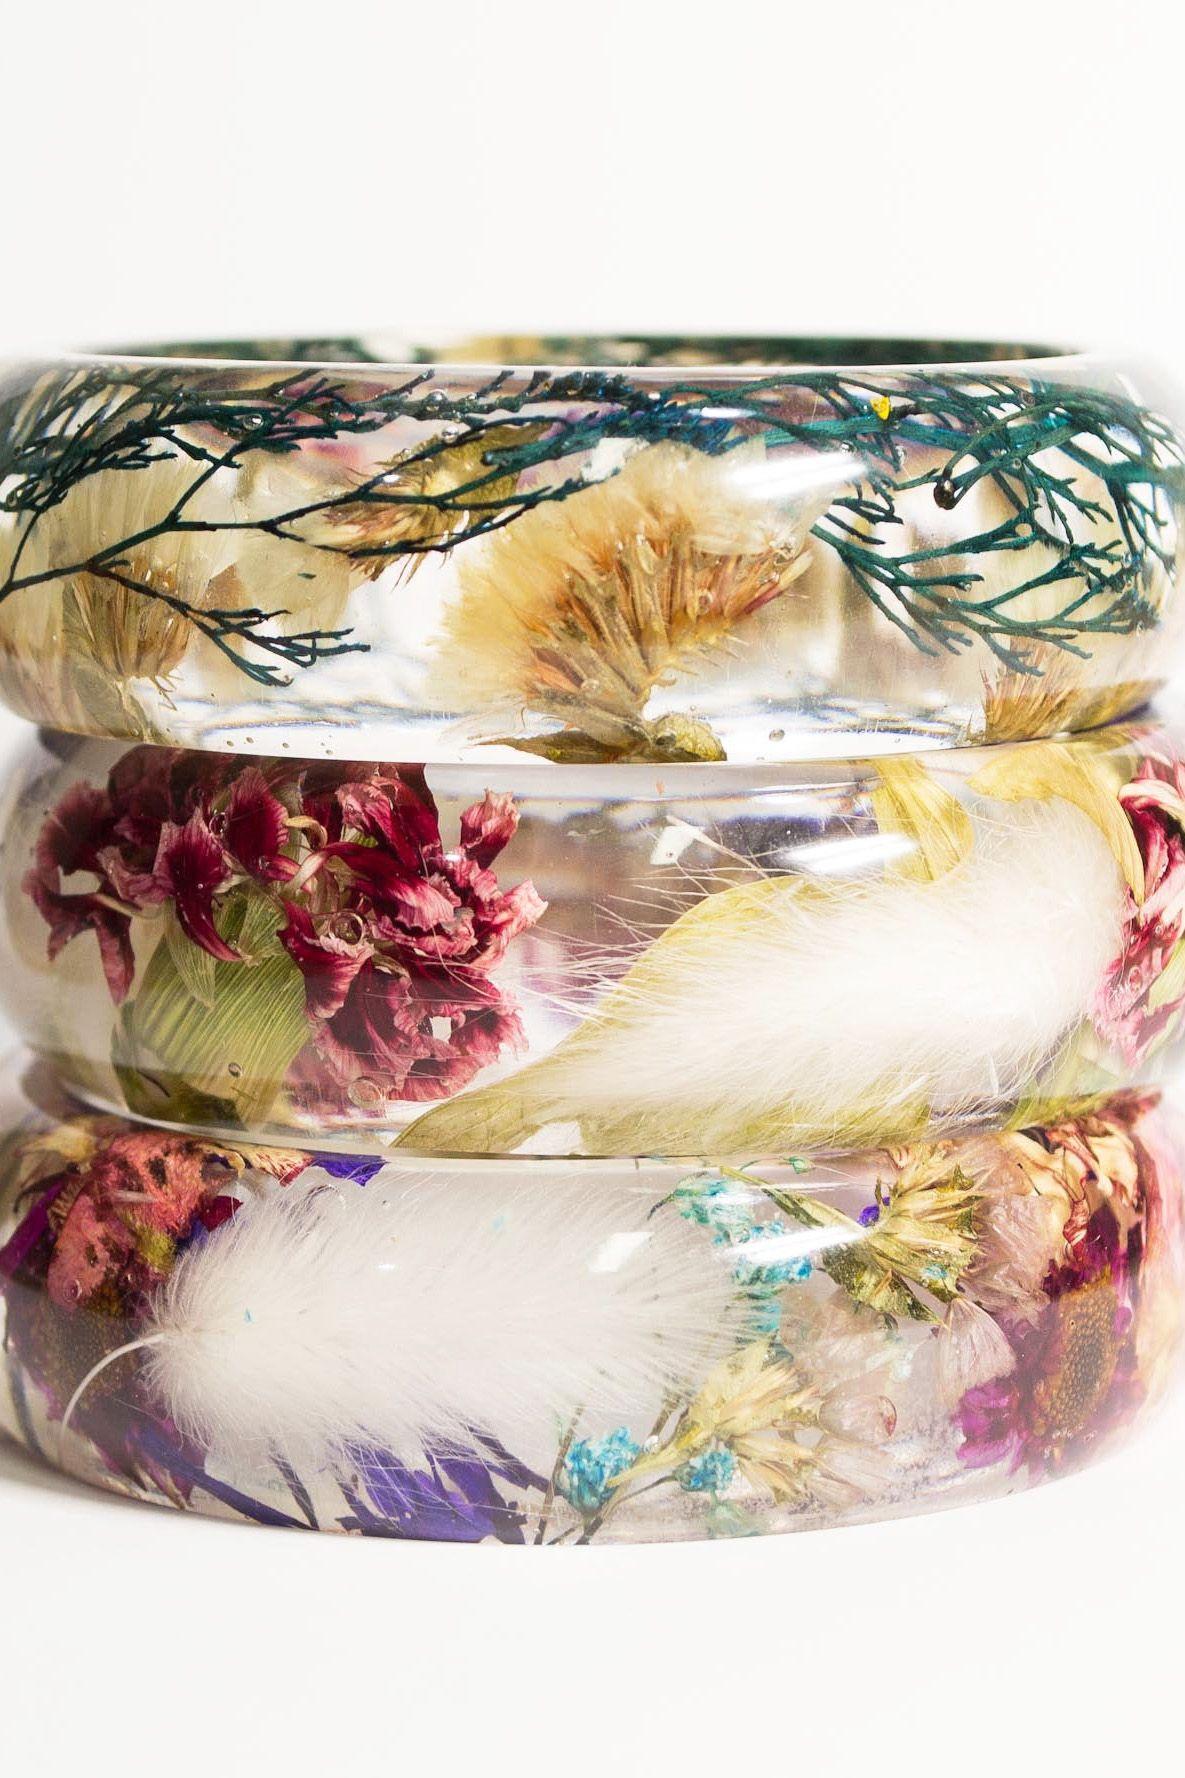 flower mini bracelet Real violet bracelet teenage girl bracelet gifts delicate bracelets tiny bracelet with flowers real violet flowers